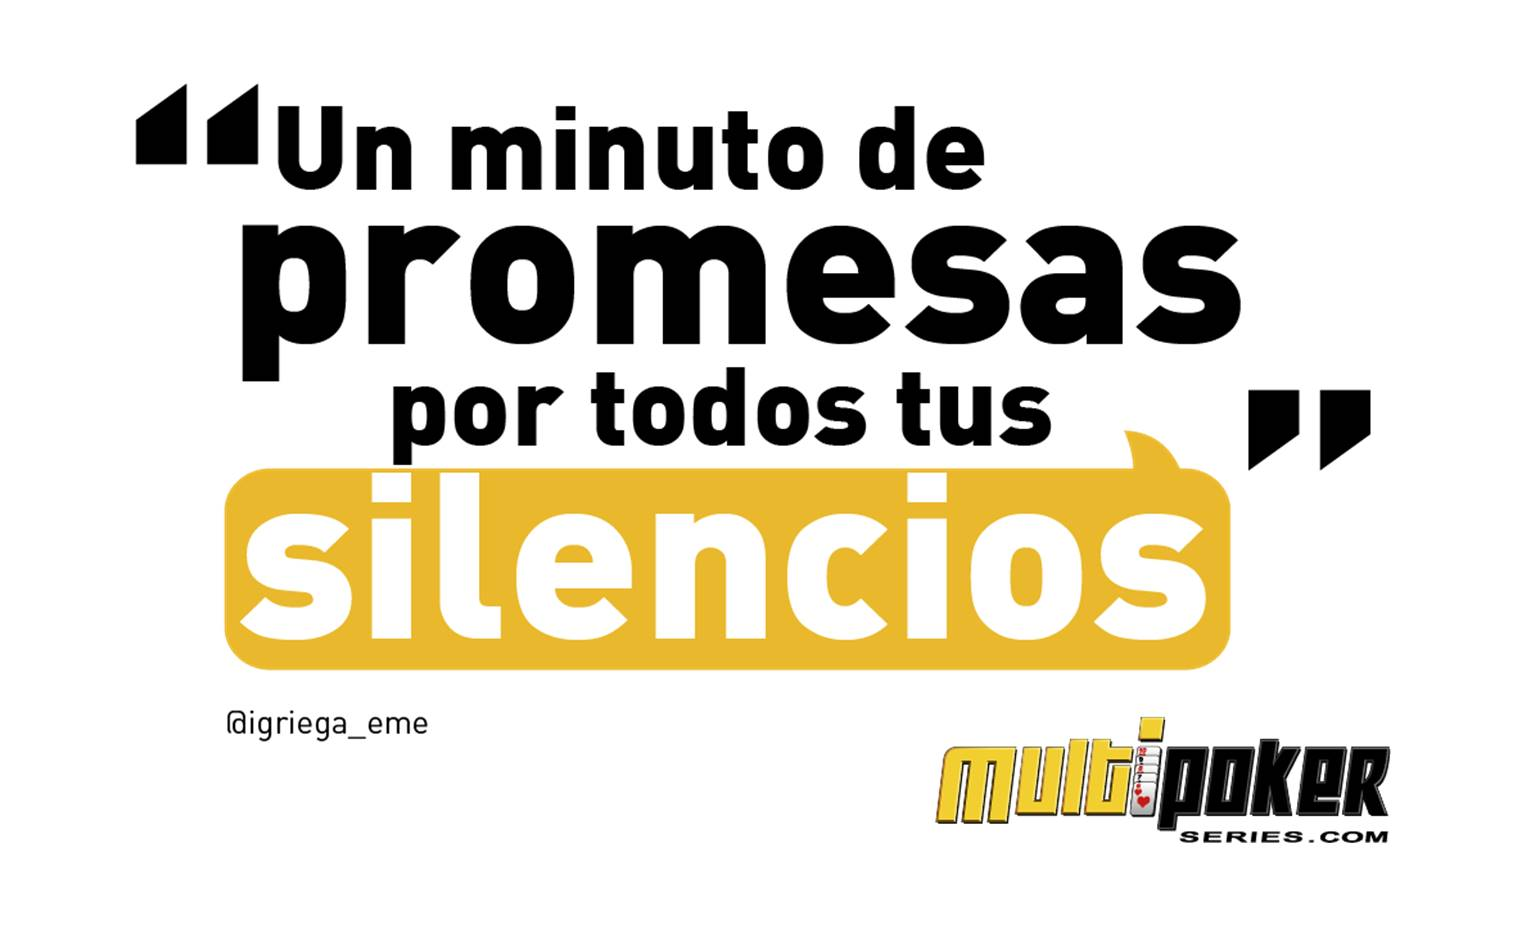 Un minuto de promesas por todos tus silencios